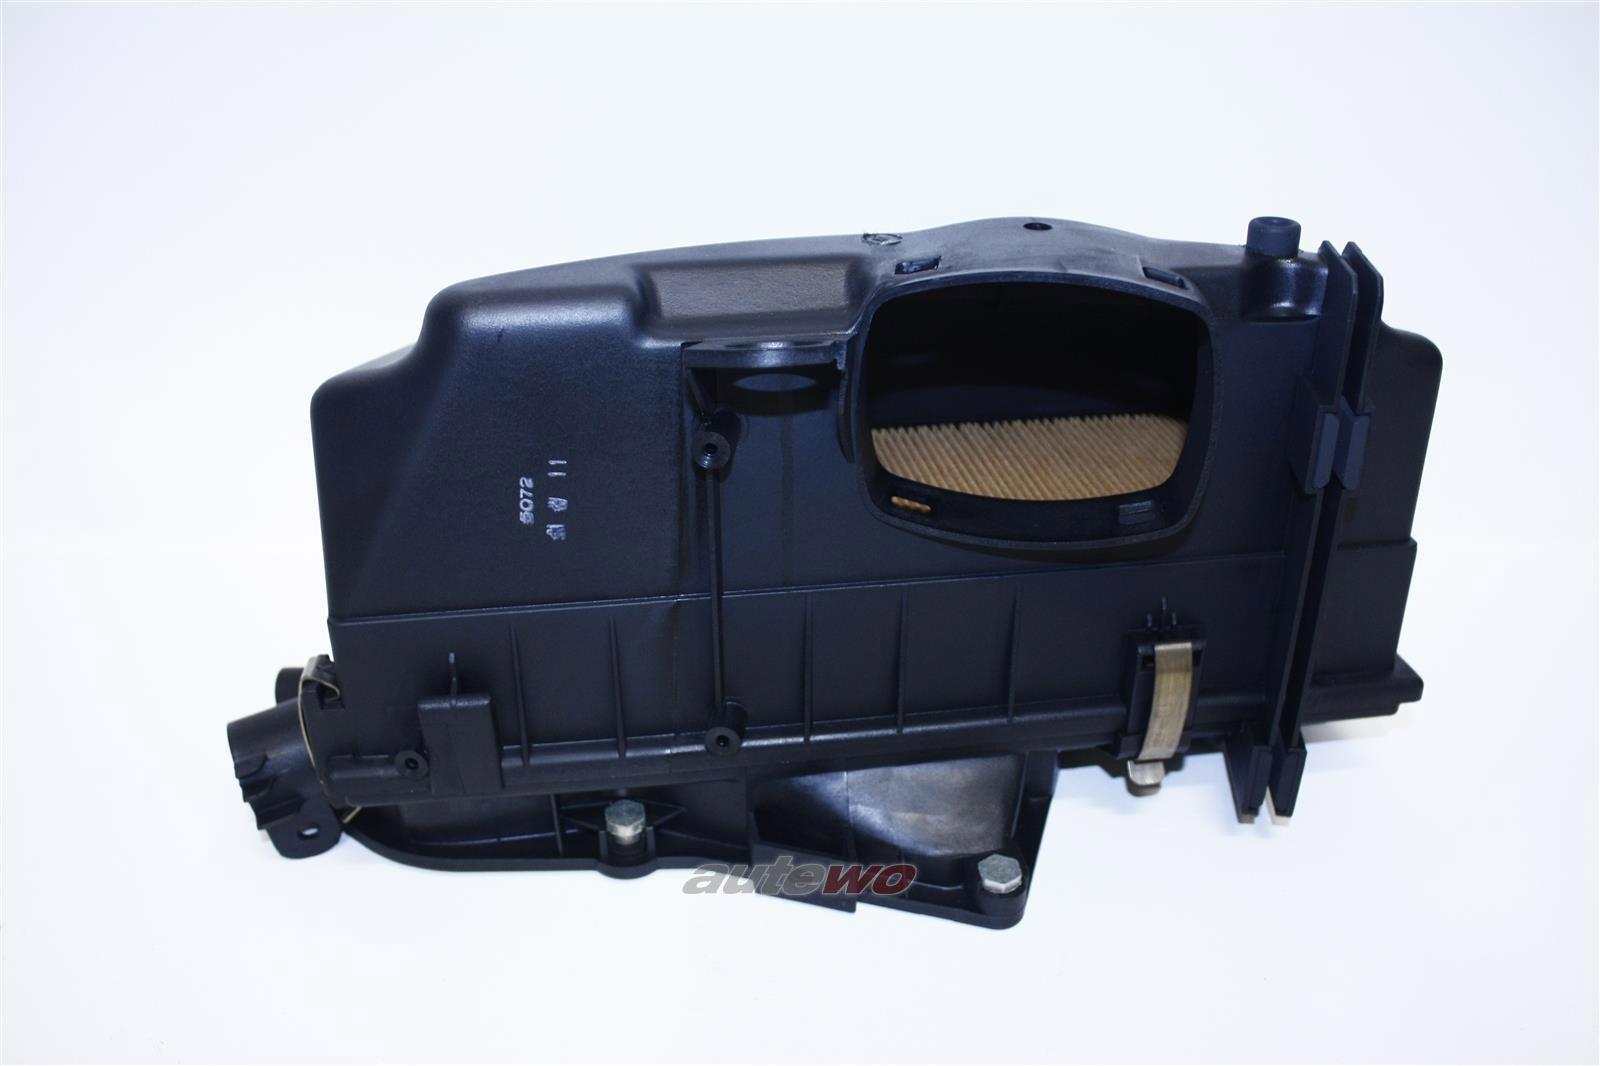 034133837AN NEU Audi 90/Coupe Typ 89 2.2l 5 Zyl. KV Luftfilterkasten